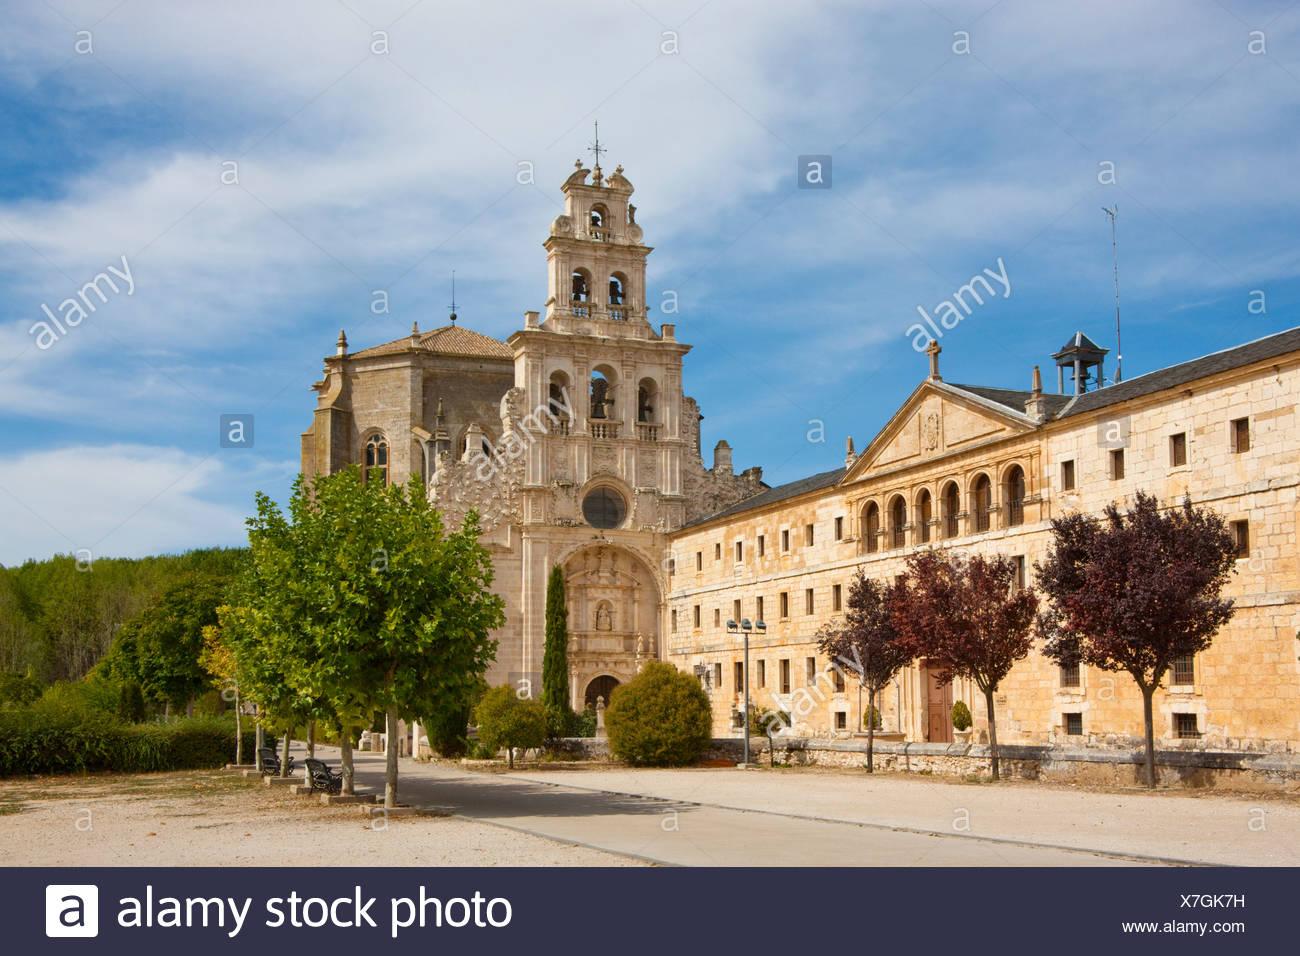 Spain, Europe, Castile Leon, cloister, monastery, La Vid, bell tower, belfry, religion - Stock Image